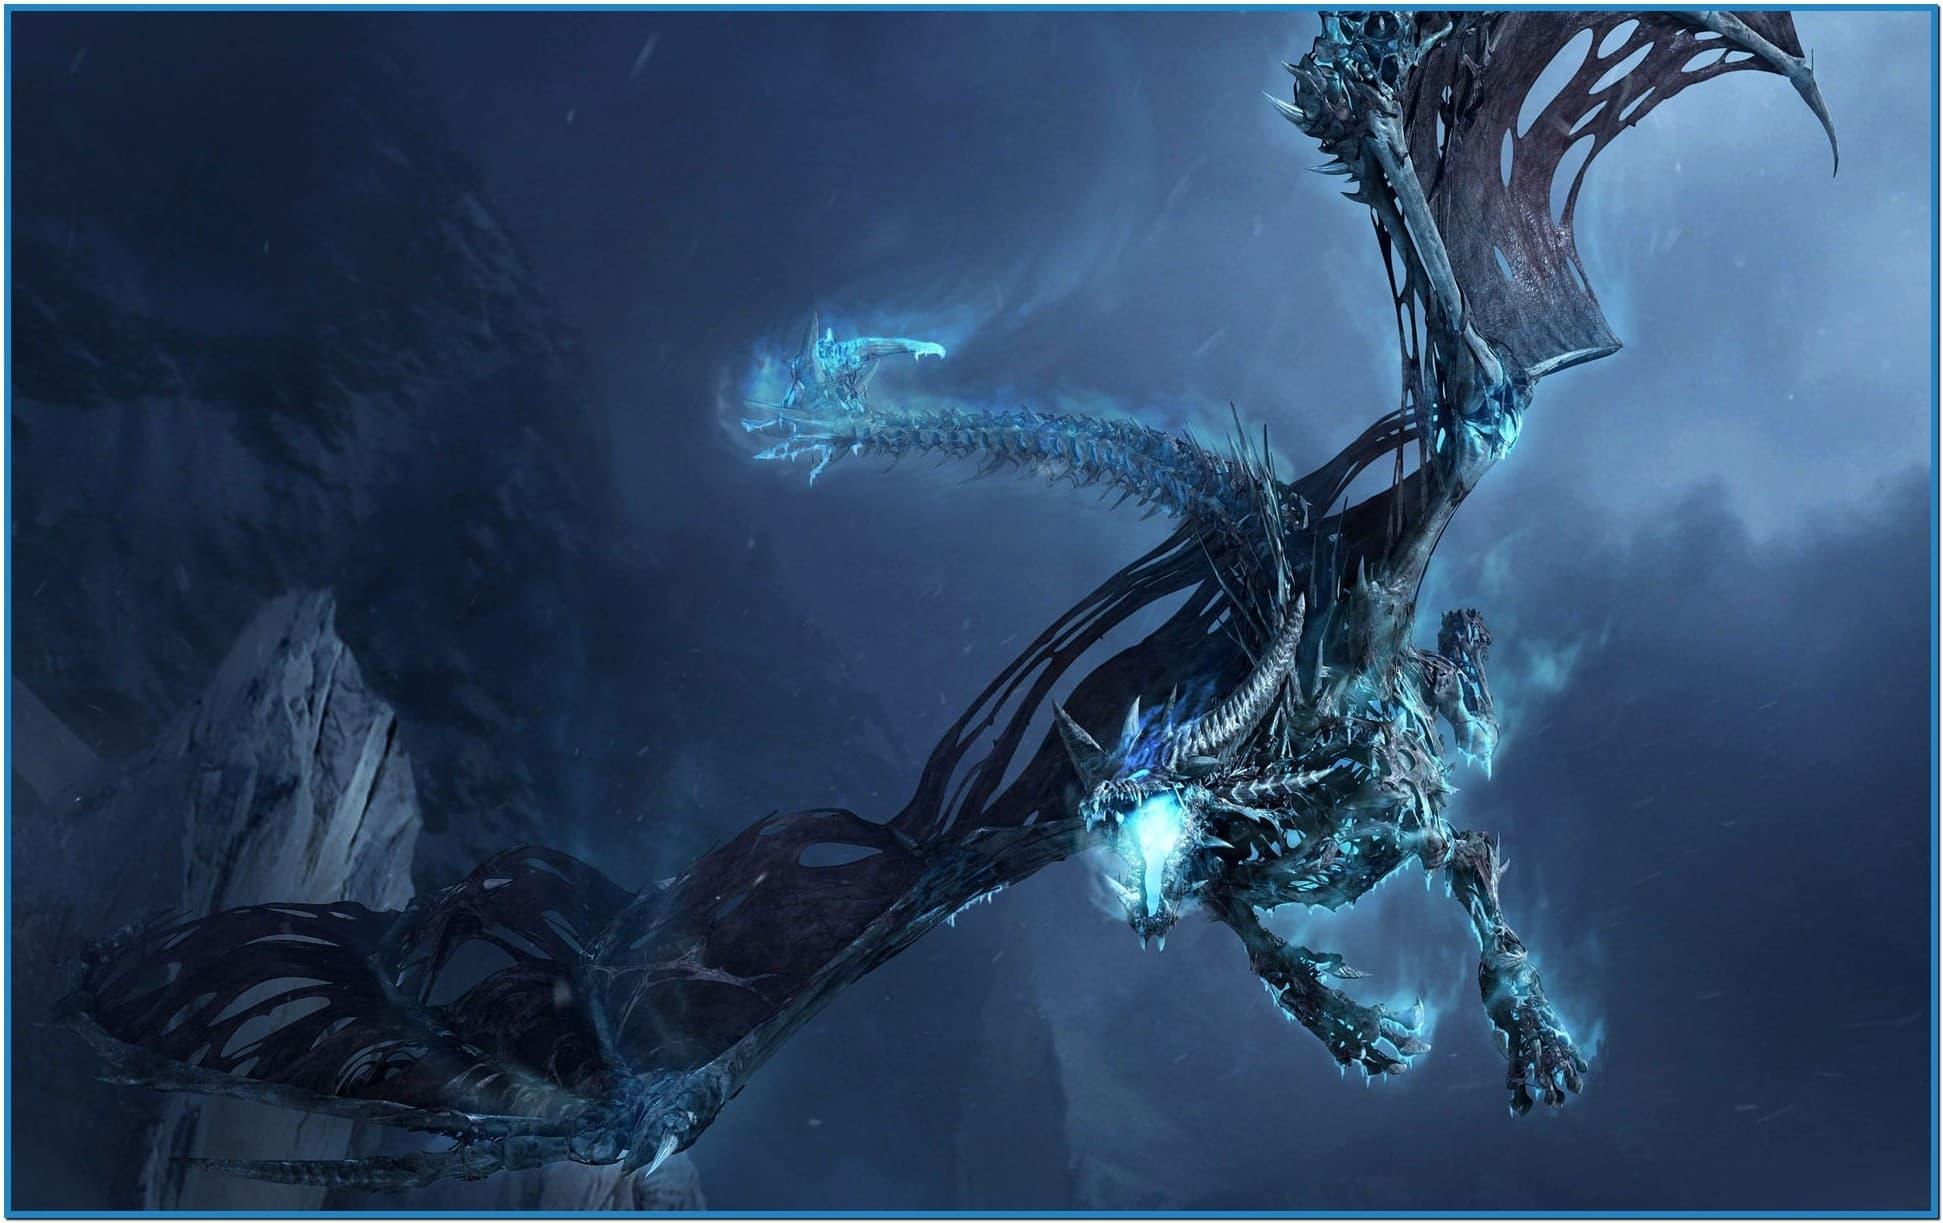 Screensavers wallpaper of dragons   Download 1943x1223